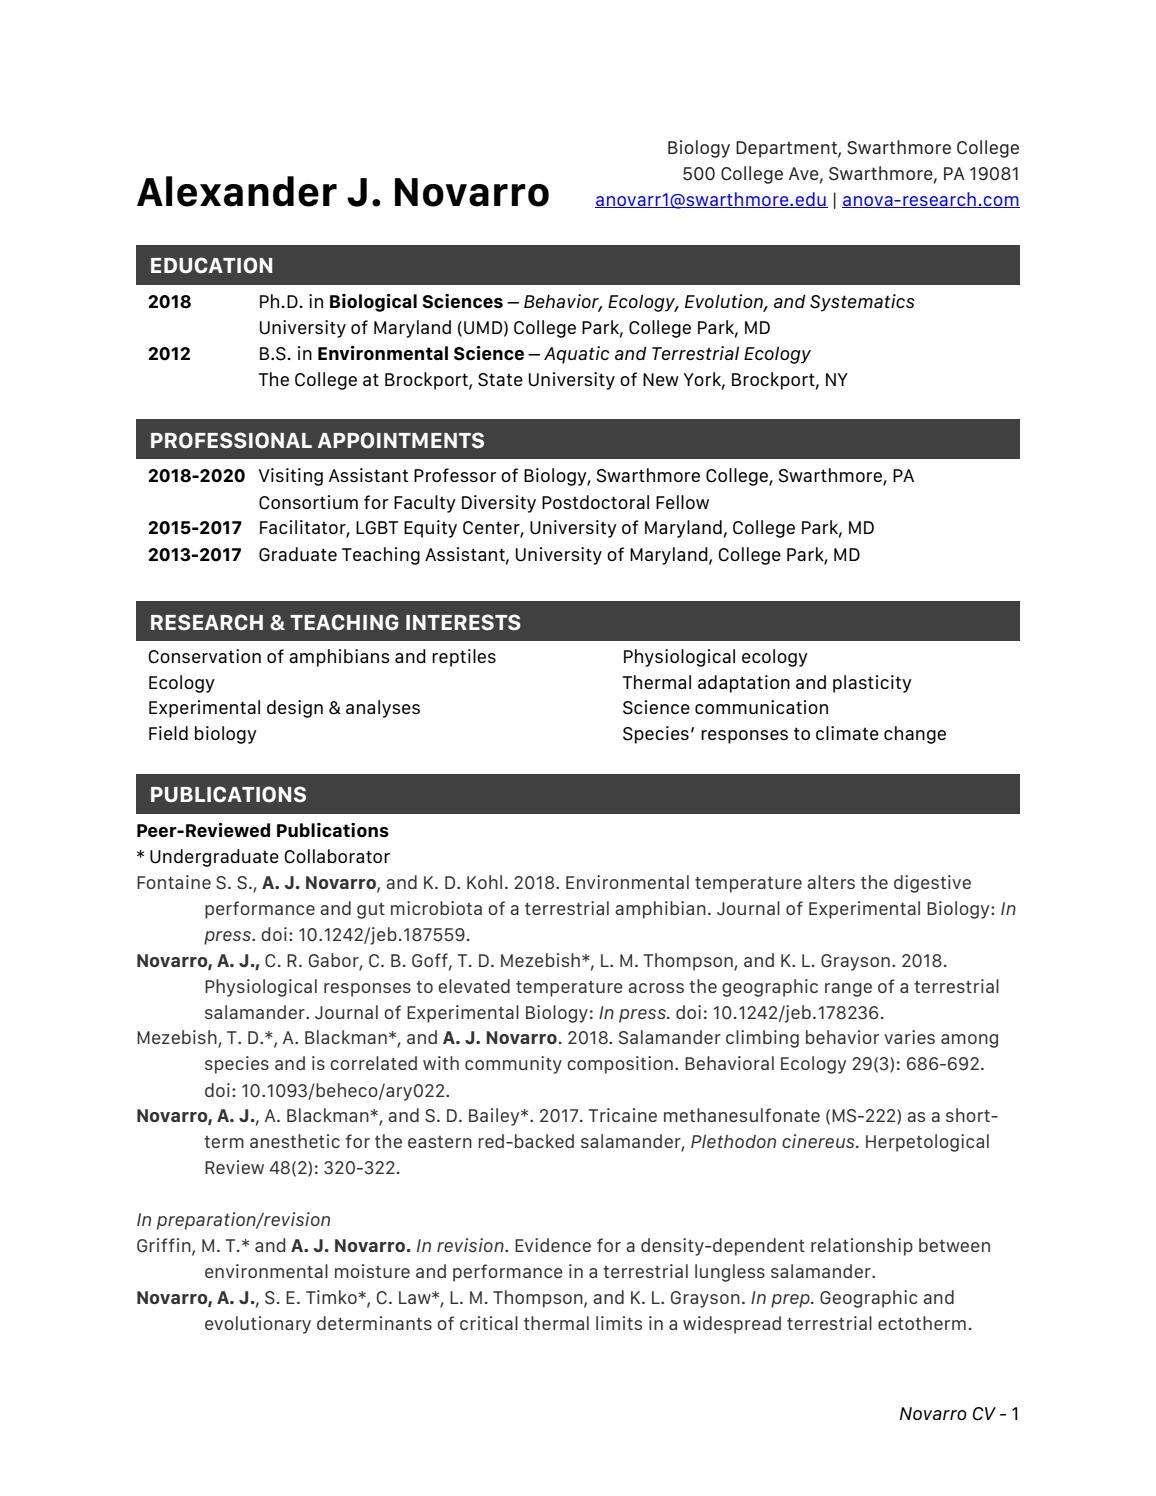 Novarro CV October 2018 by ANOVA Research - issuu